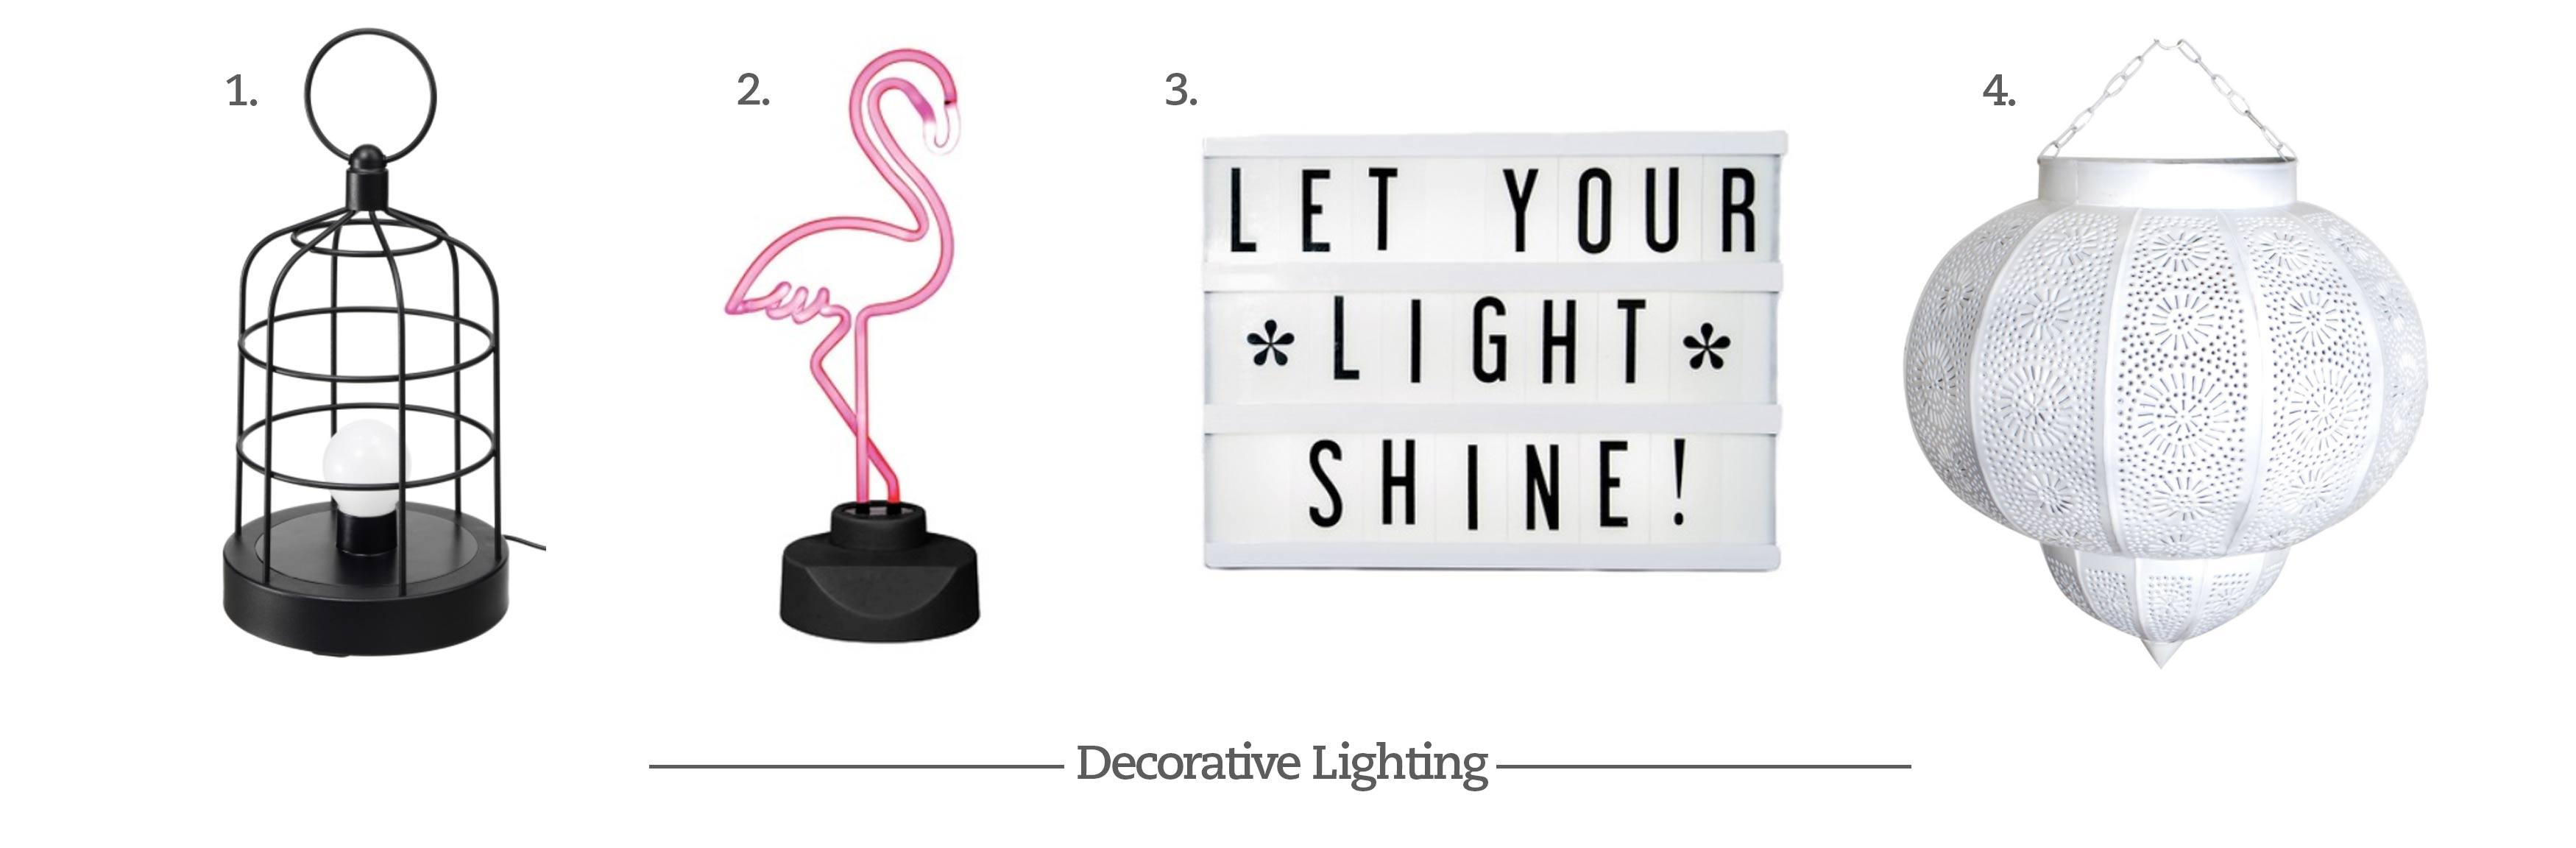 Decorative Lighting Options